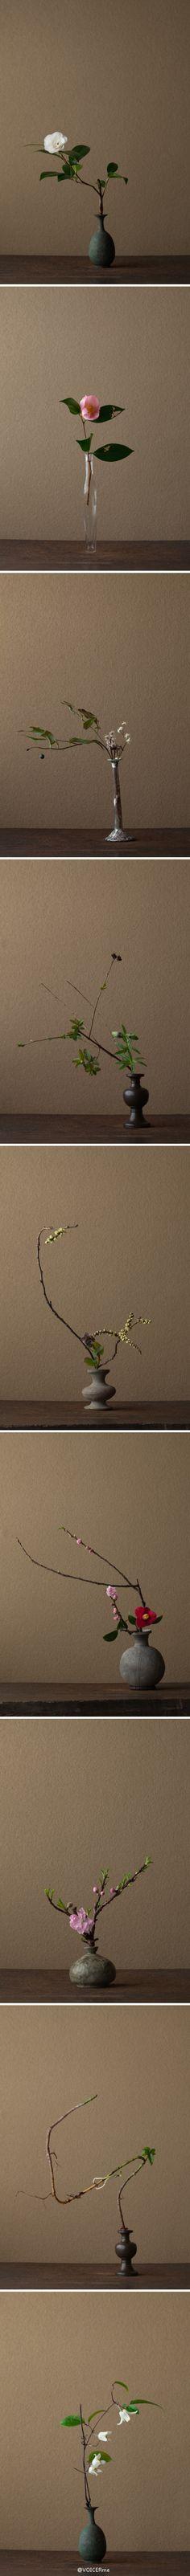 'Ikebana' and 'Kado', traditional flower arrangement in Japan - 生け花, 華道, 日本 Ikebana Flower Arrangement, Ikebana Arrangements, Flower Vases, Floral Arrangements, Japanese Flowers, Japanese Art, Japanese Culture, Japanese Style, Sogetsu Ikebana